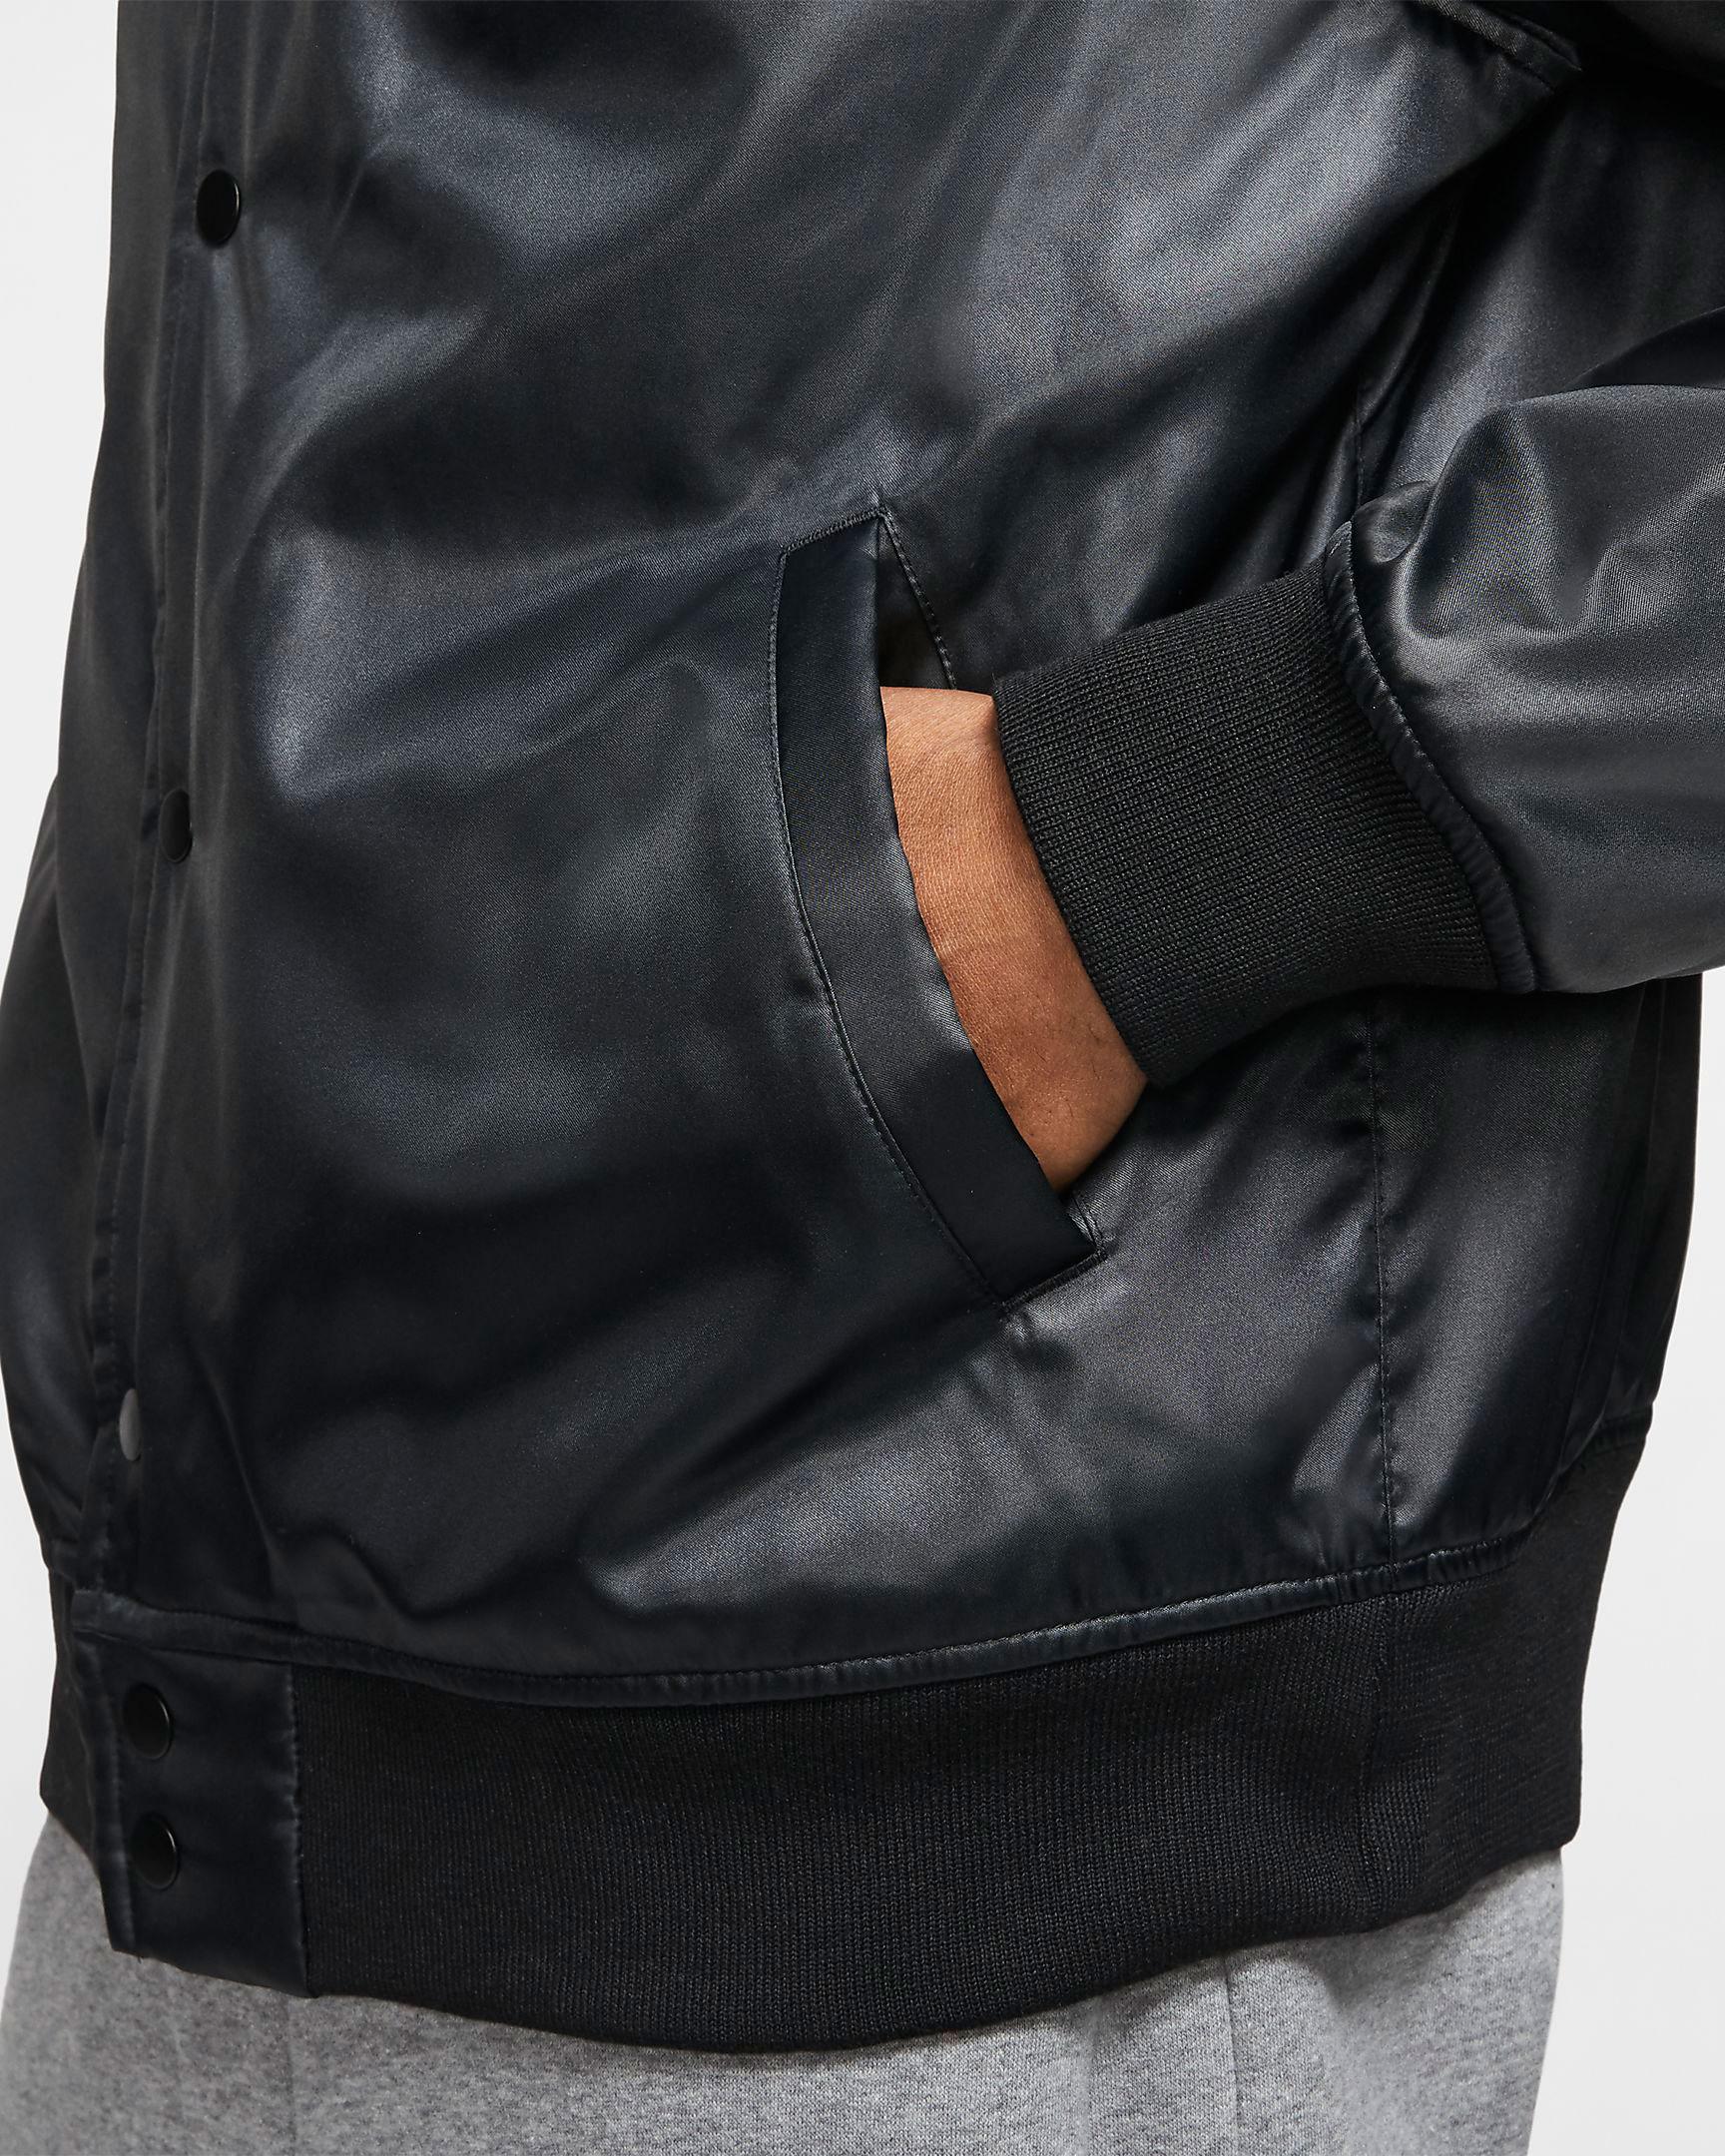 air-jordan-3-knicks-rivals-jacket-4